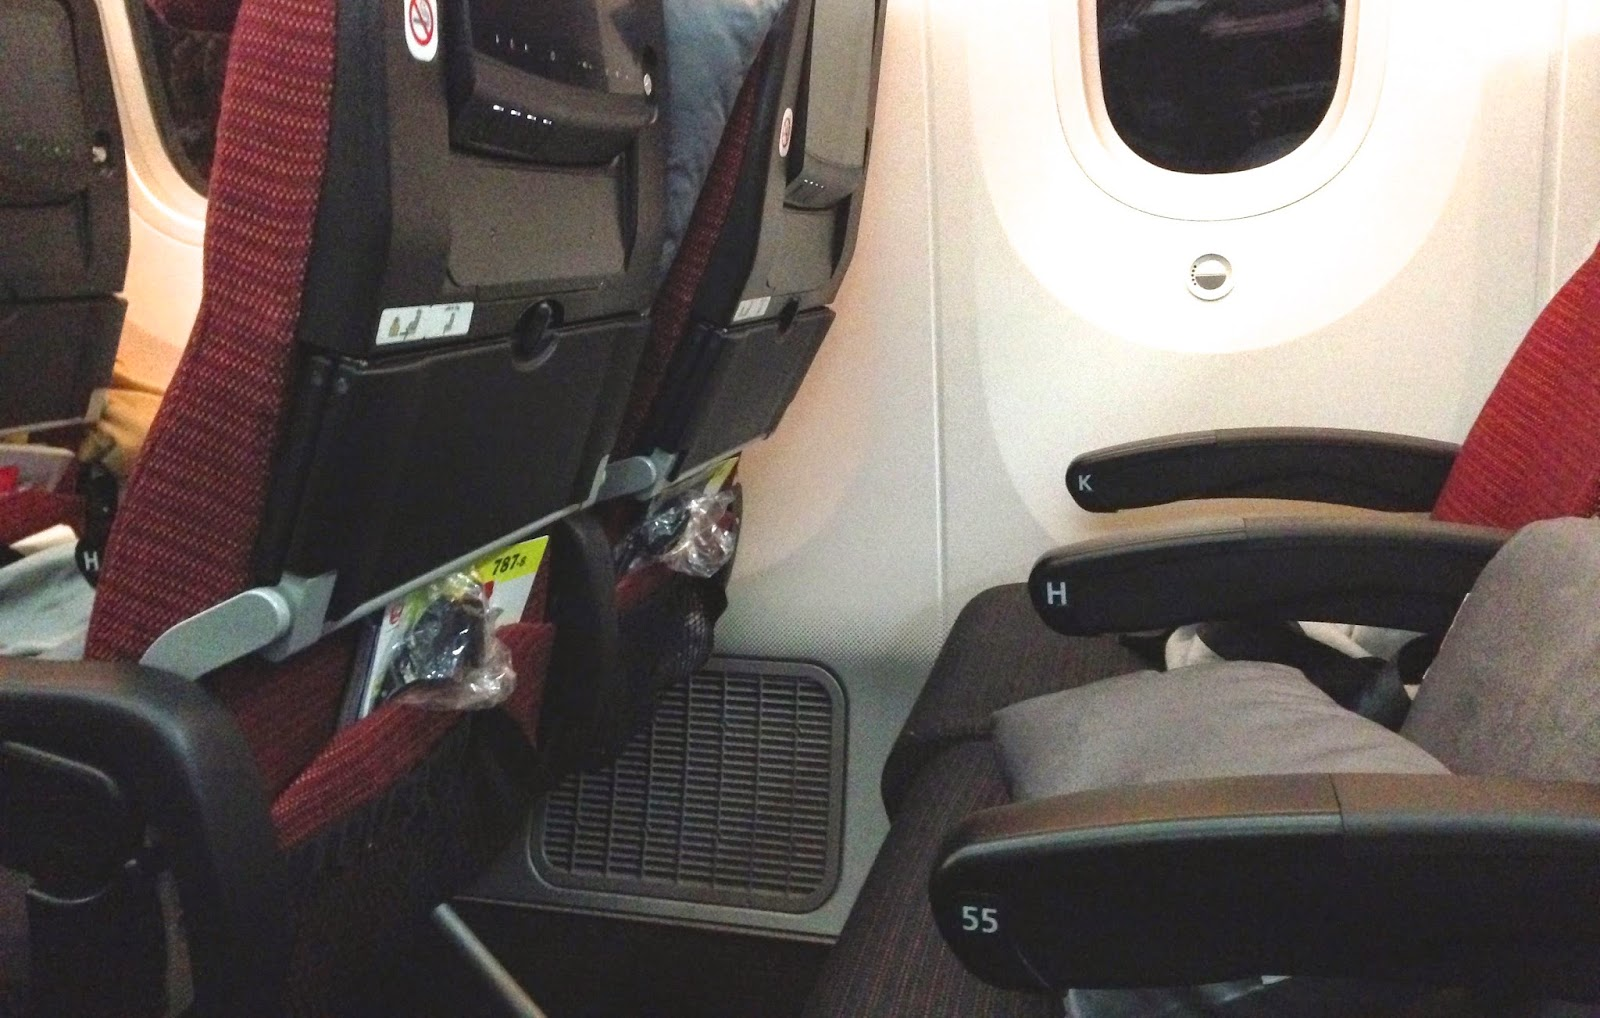 JALエコノミークラス座席 JAL Economyclass-flight-seat-late787